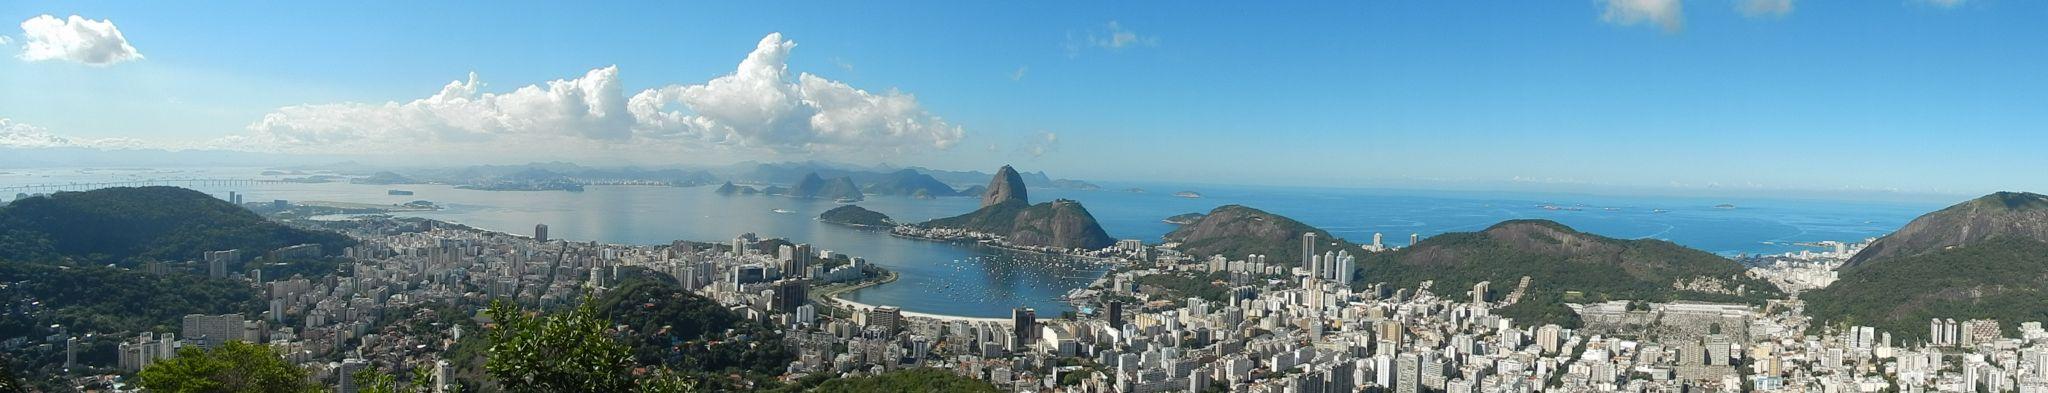 Rio de Janeiro panoramic from Christ